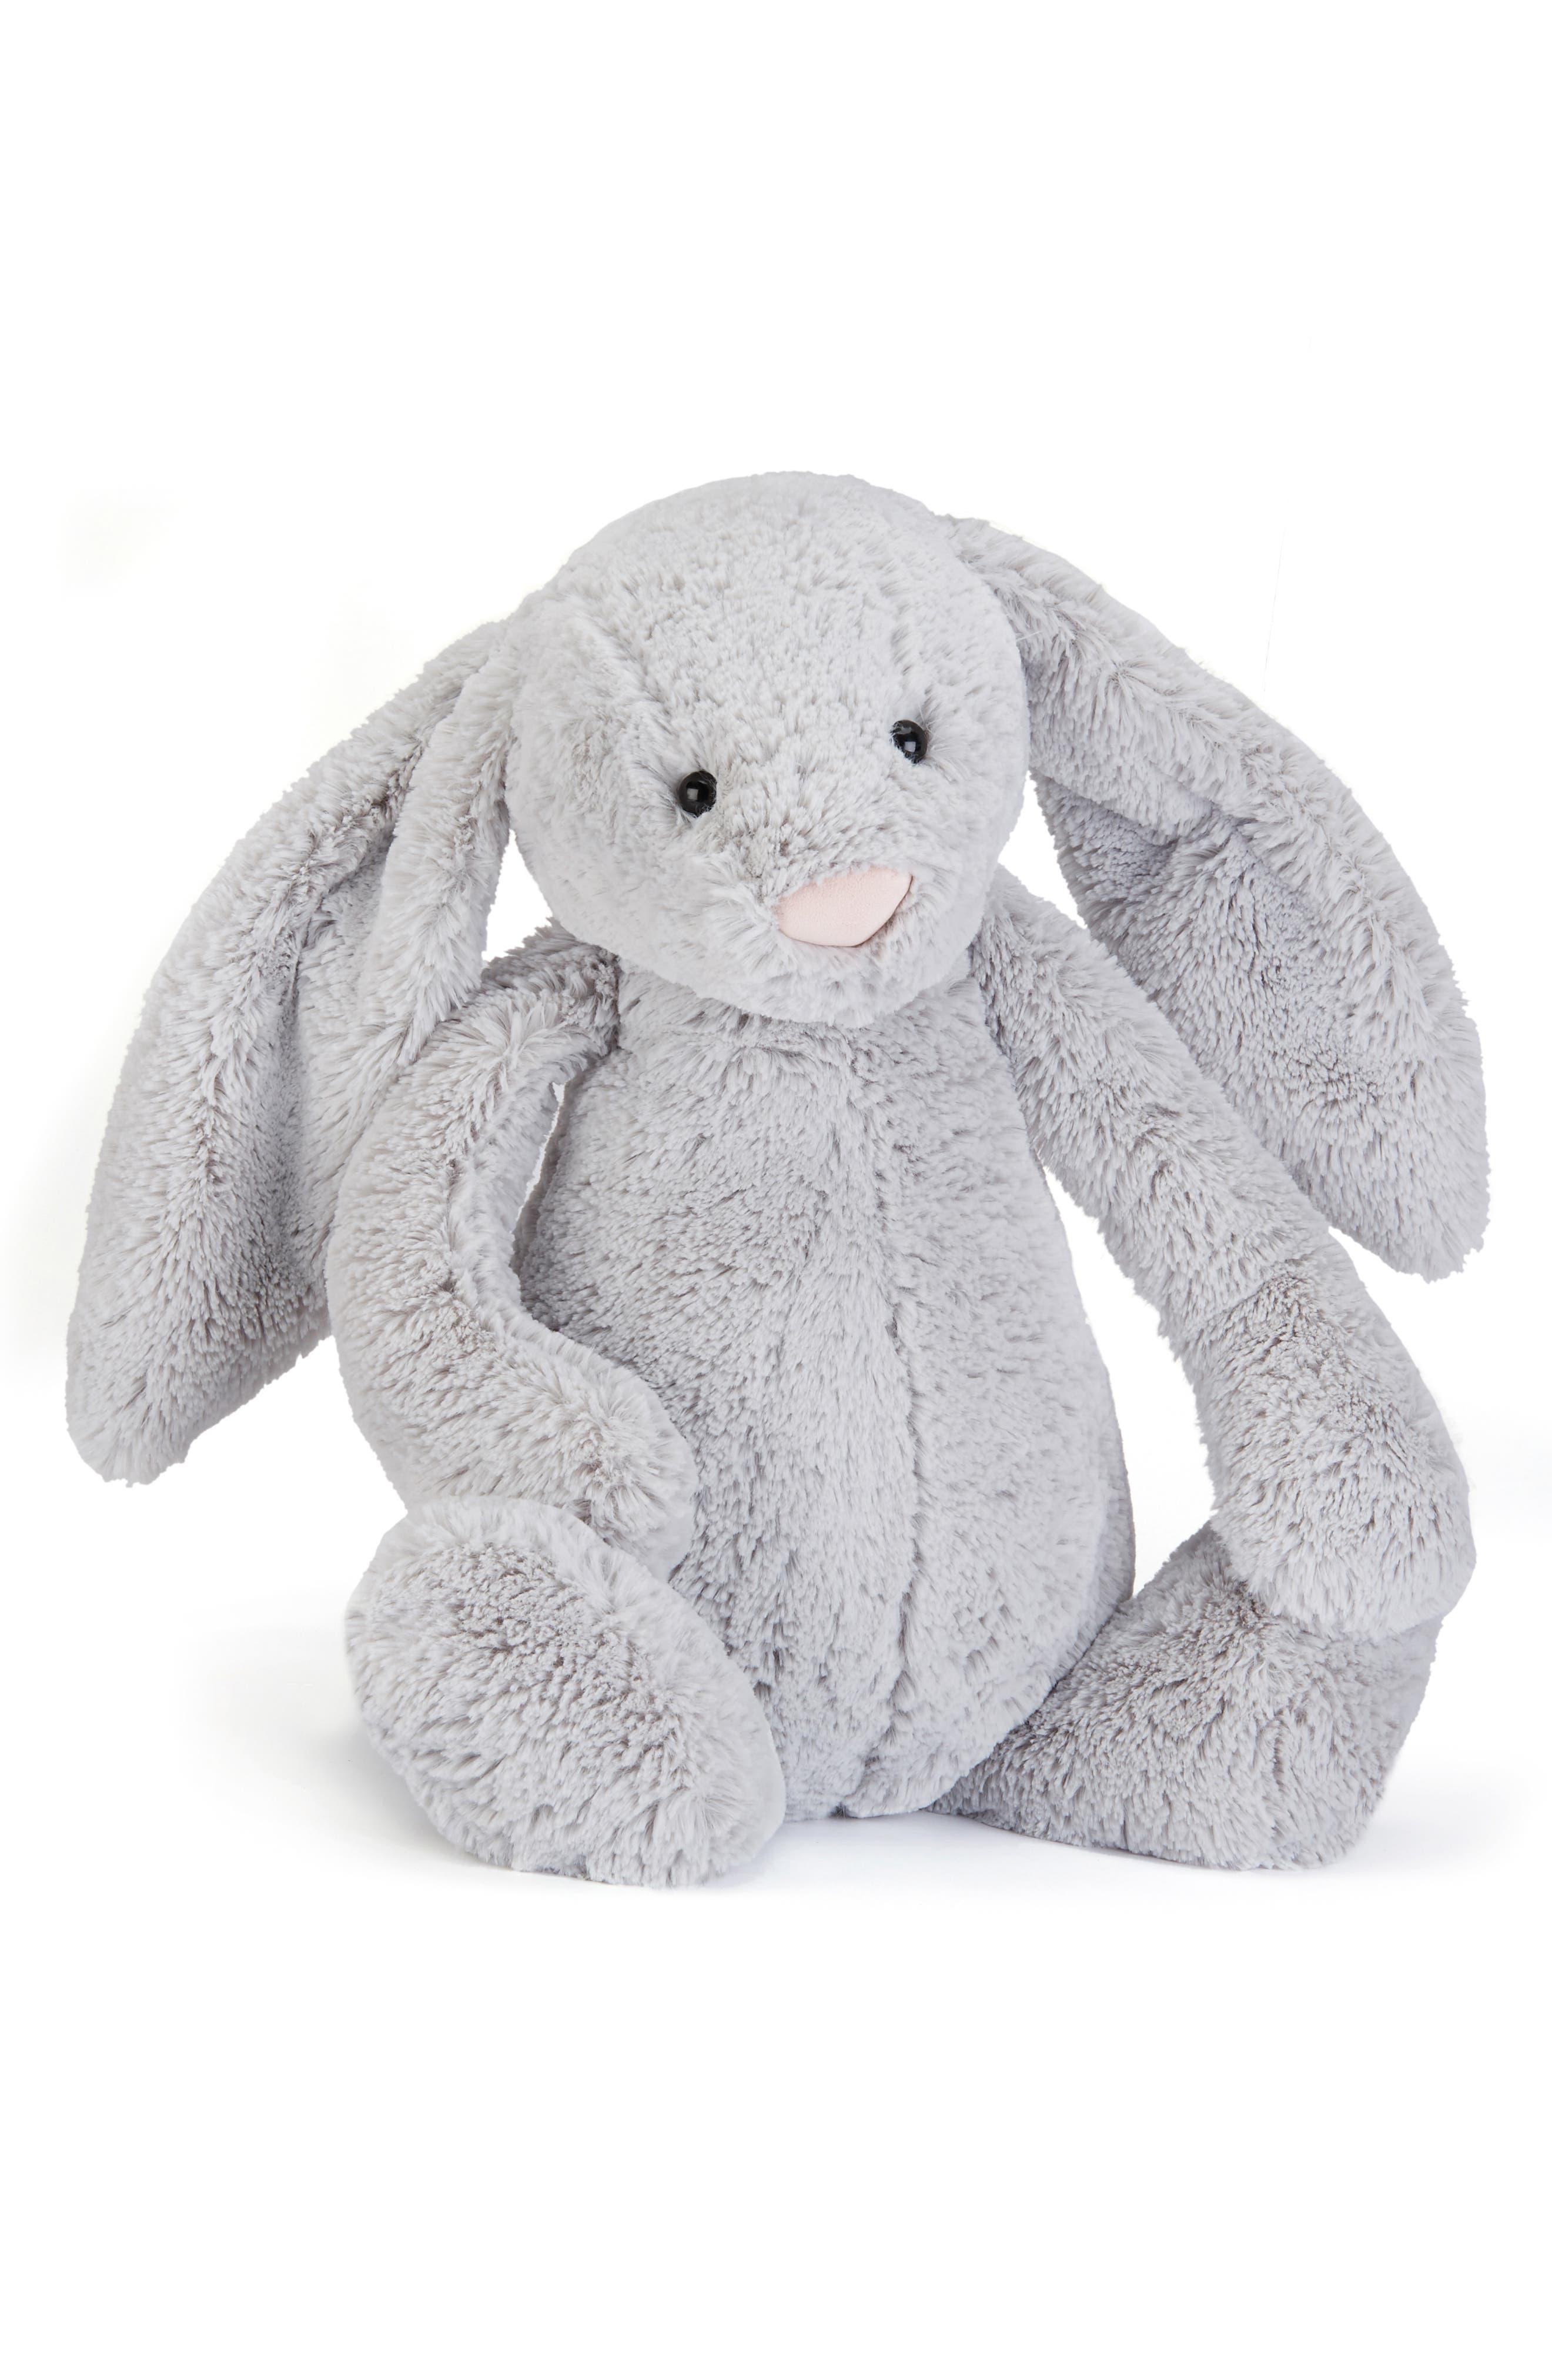 Bunny Stuffed Animal,                             Main thumbnail 1, color,                             Grey